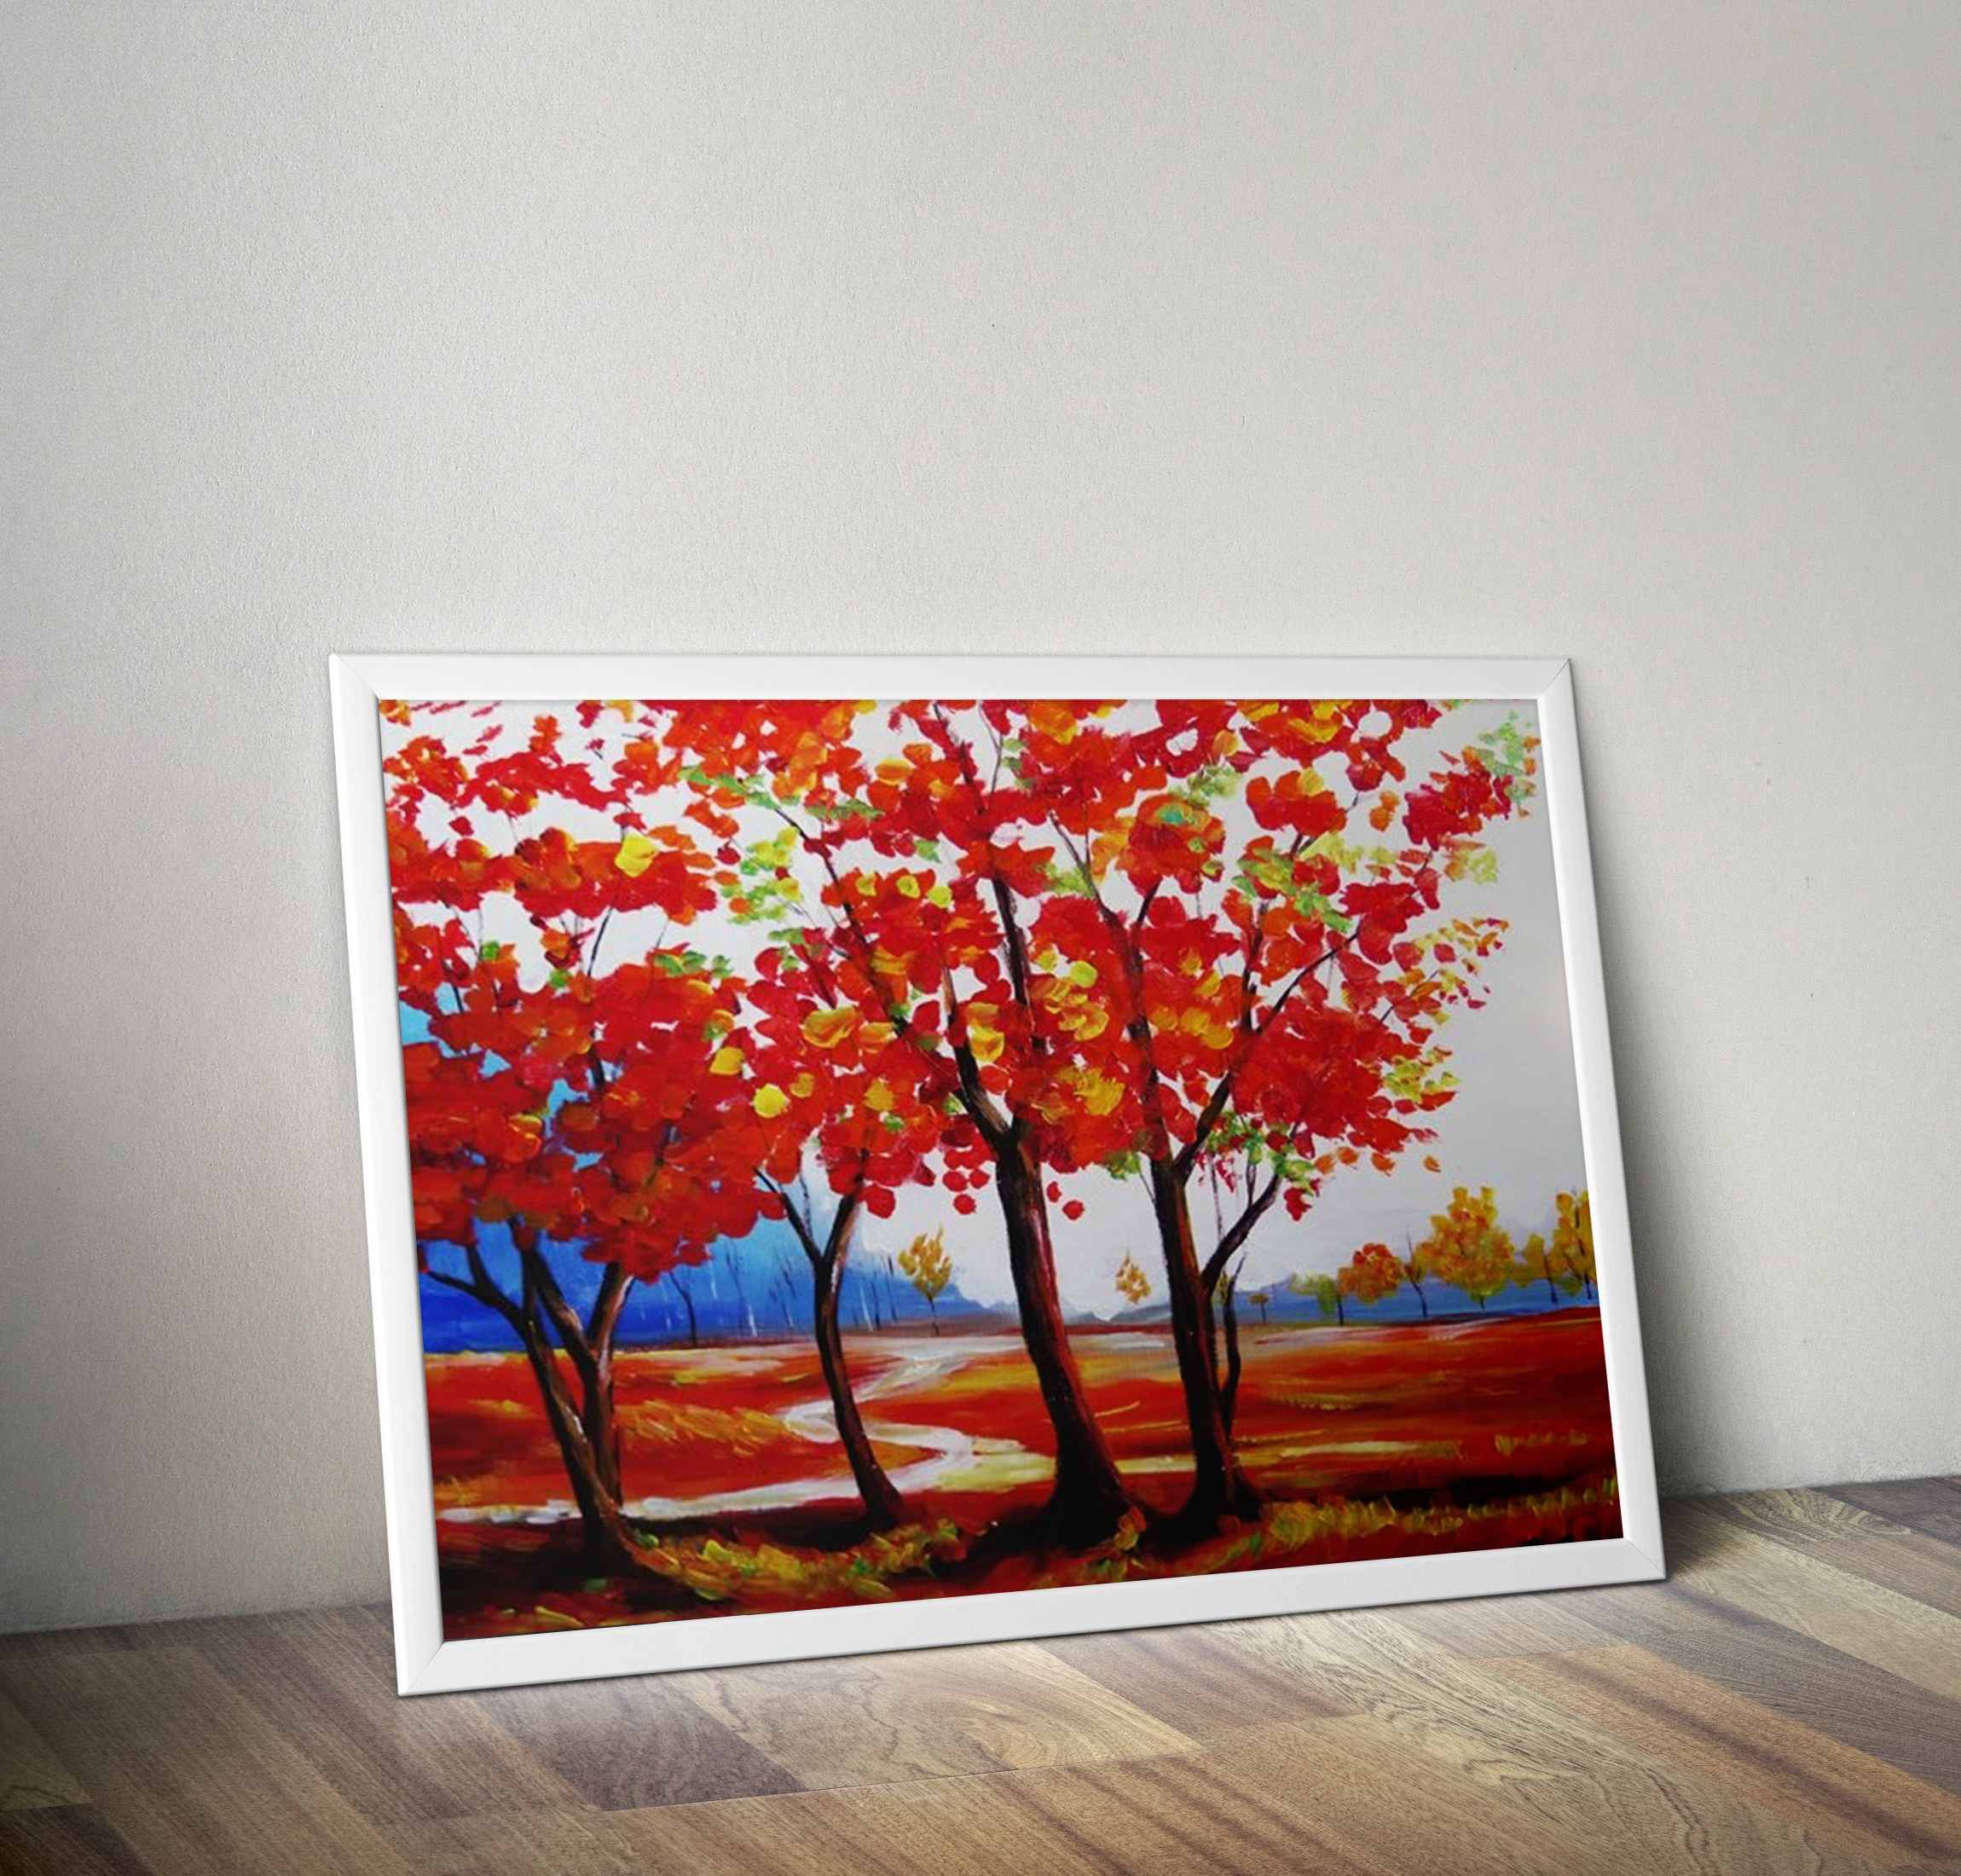 We paint - Autumn_19_AUGUST.jpg